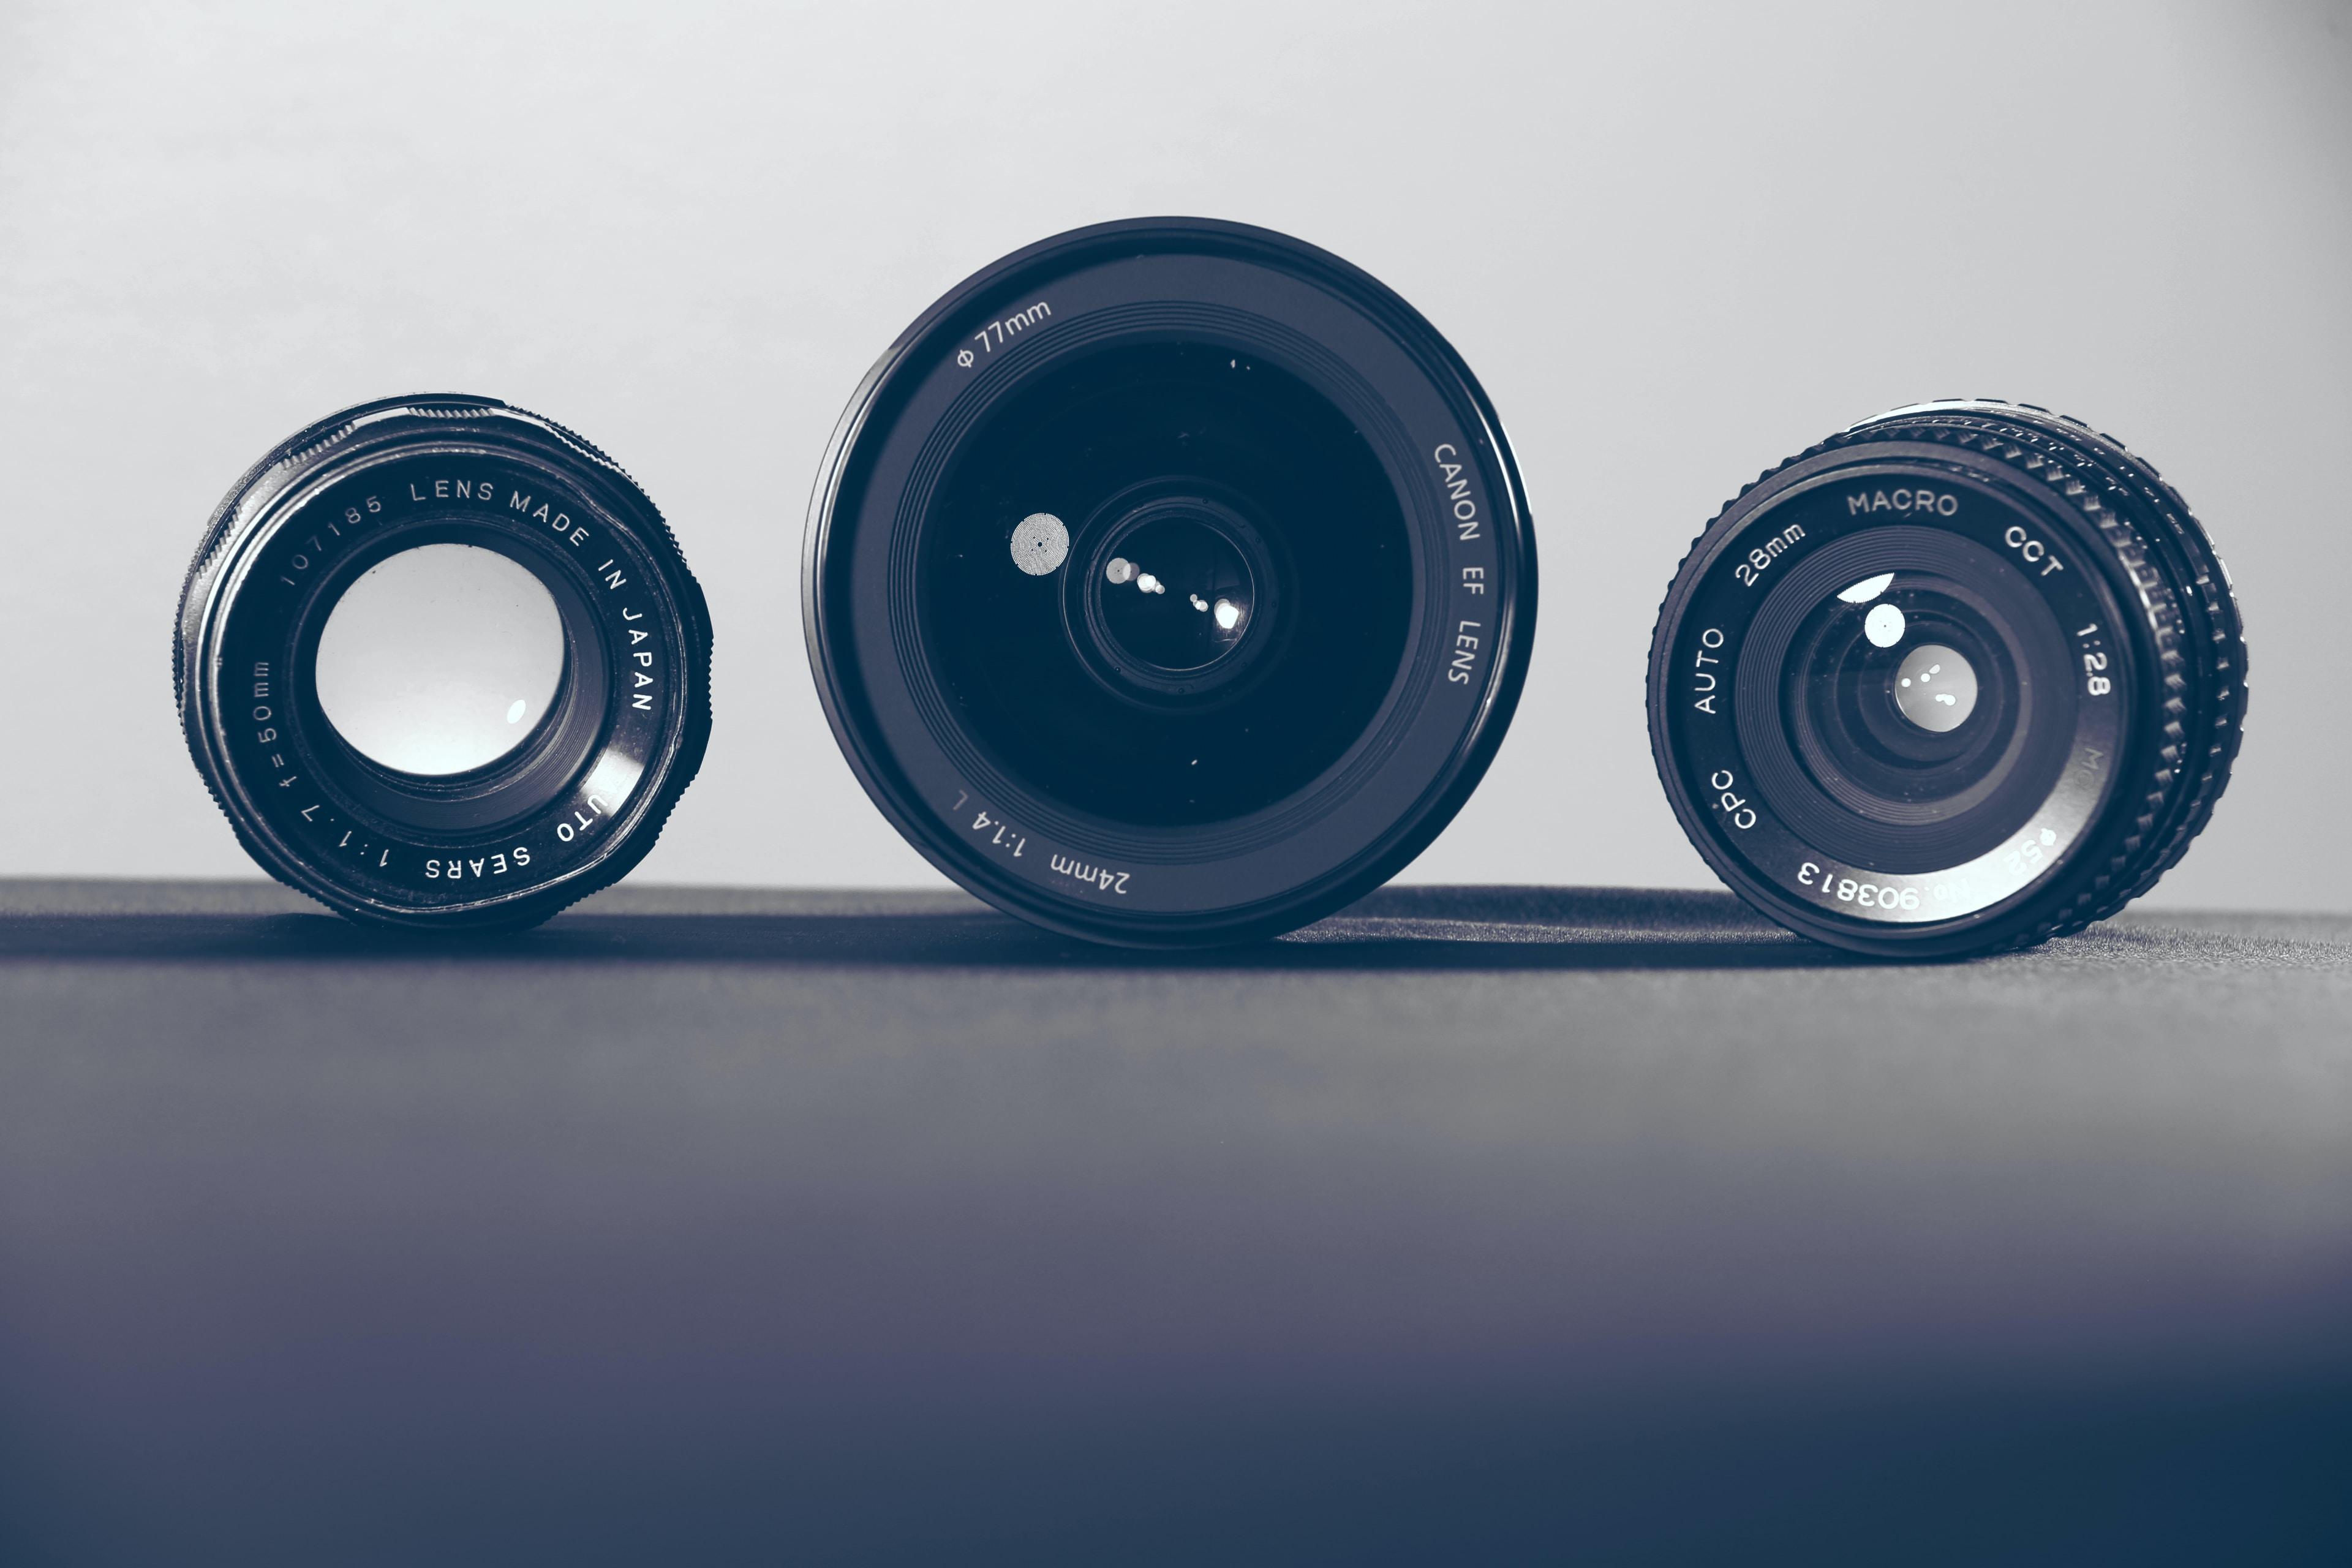 three black camera lenses on gray surface